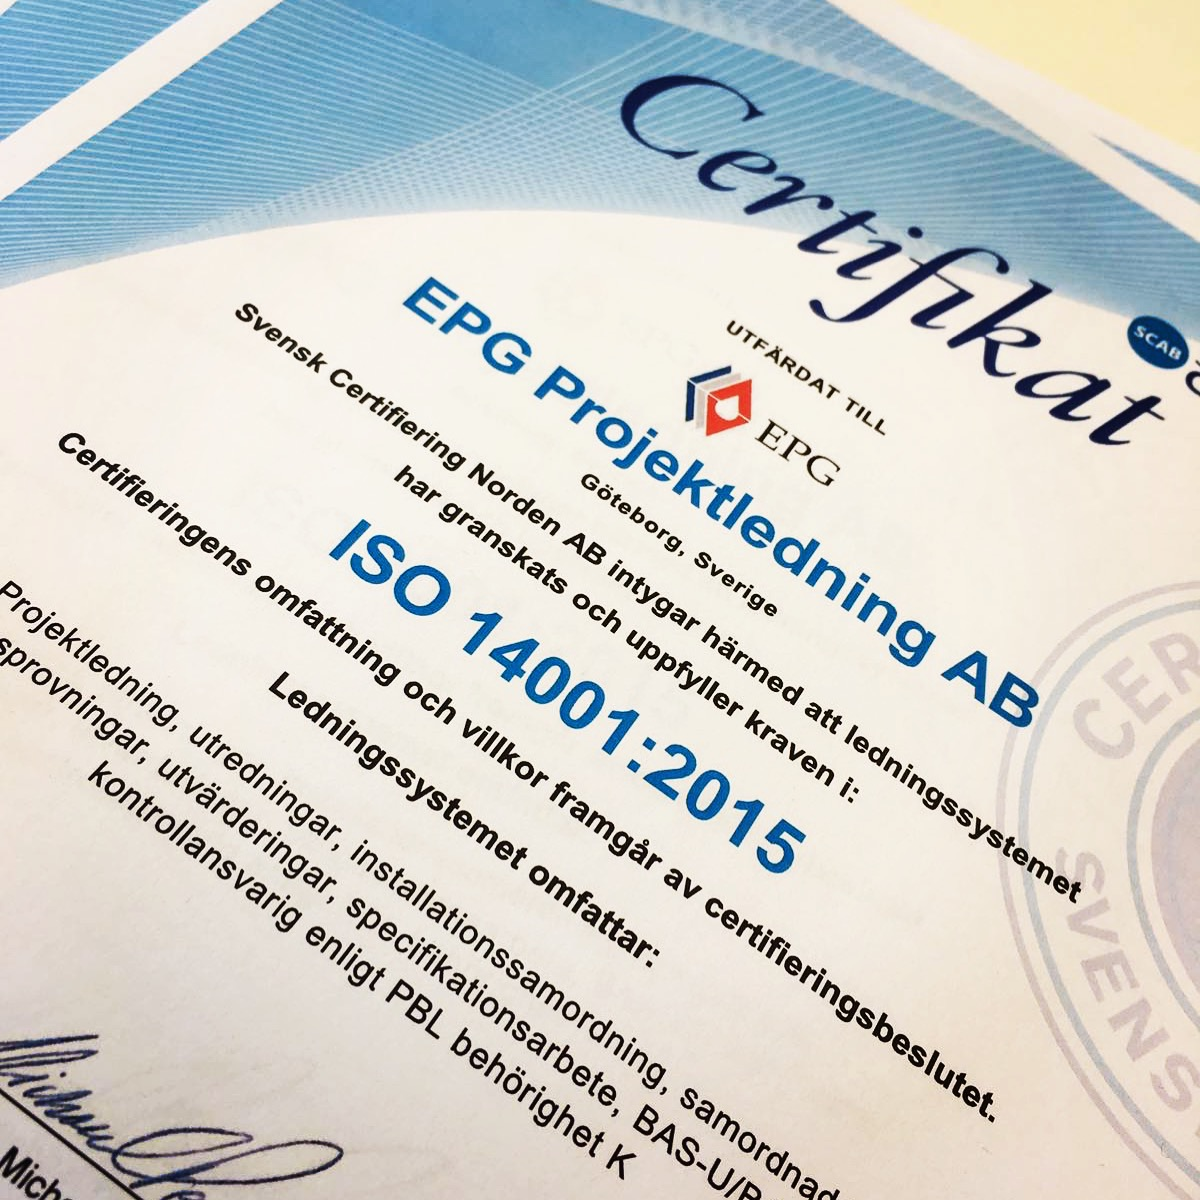 epg projektledning certifieringar